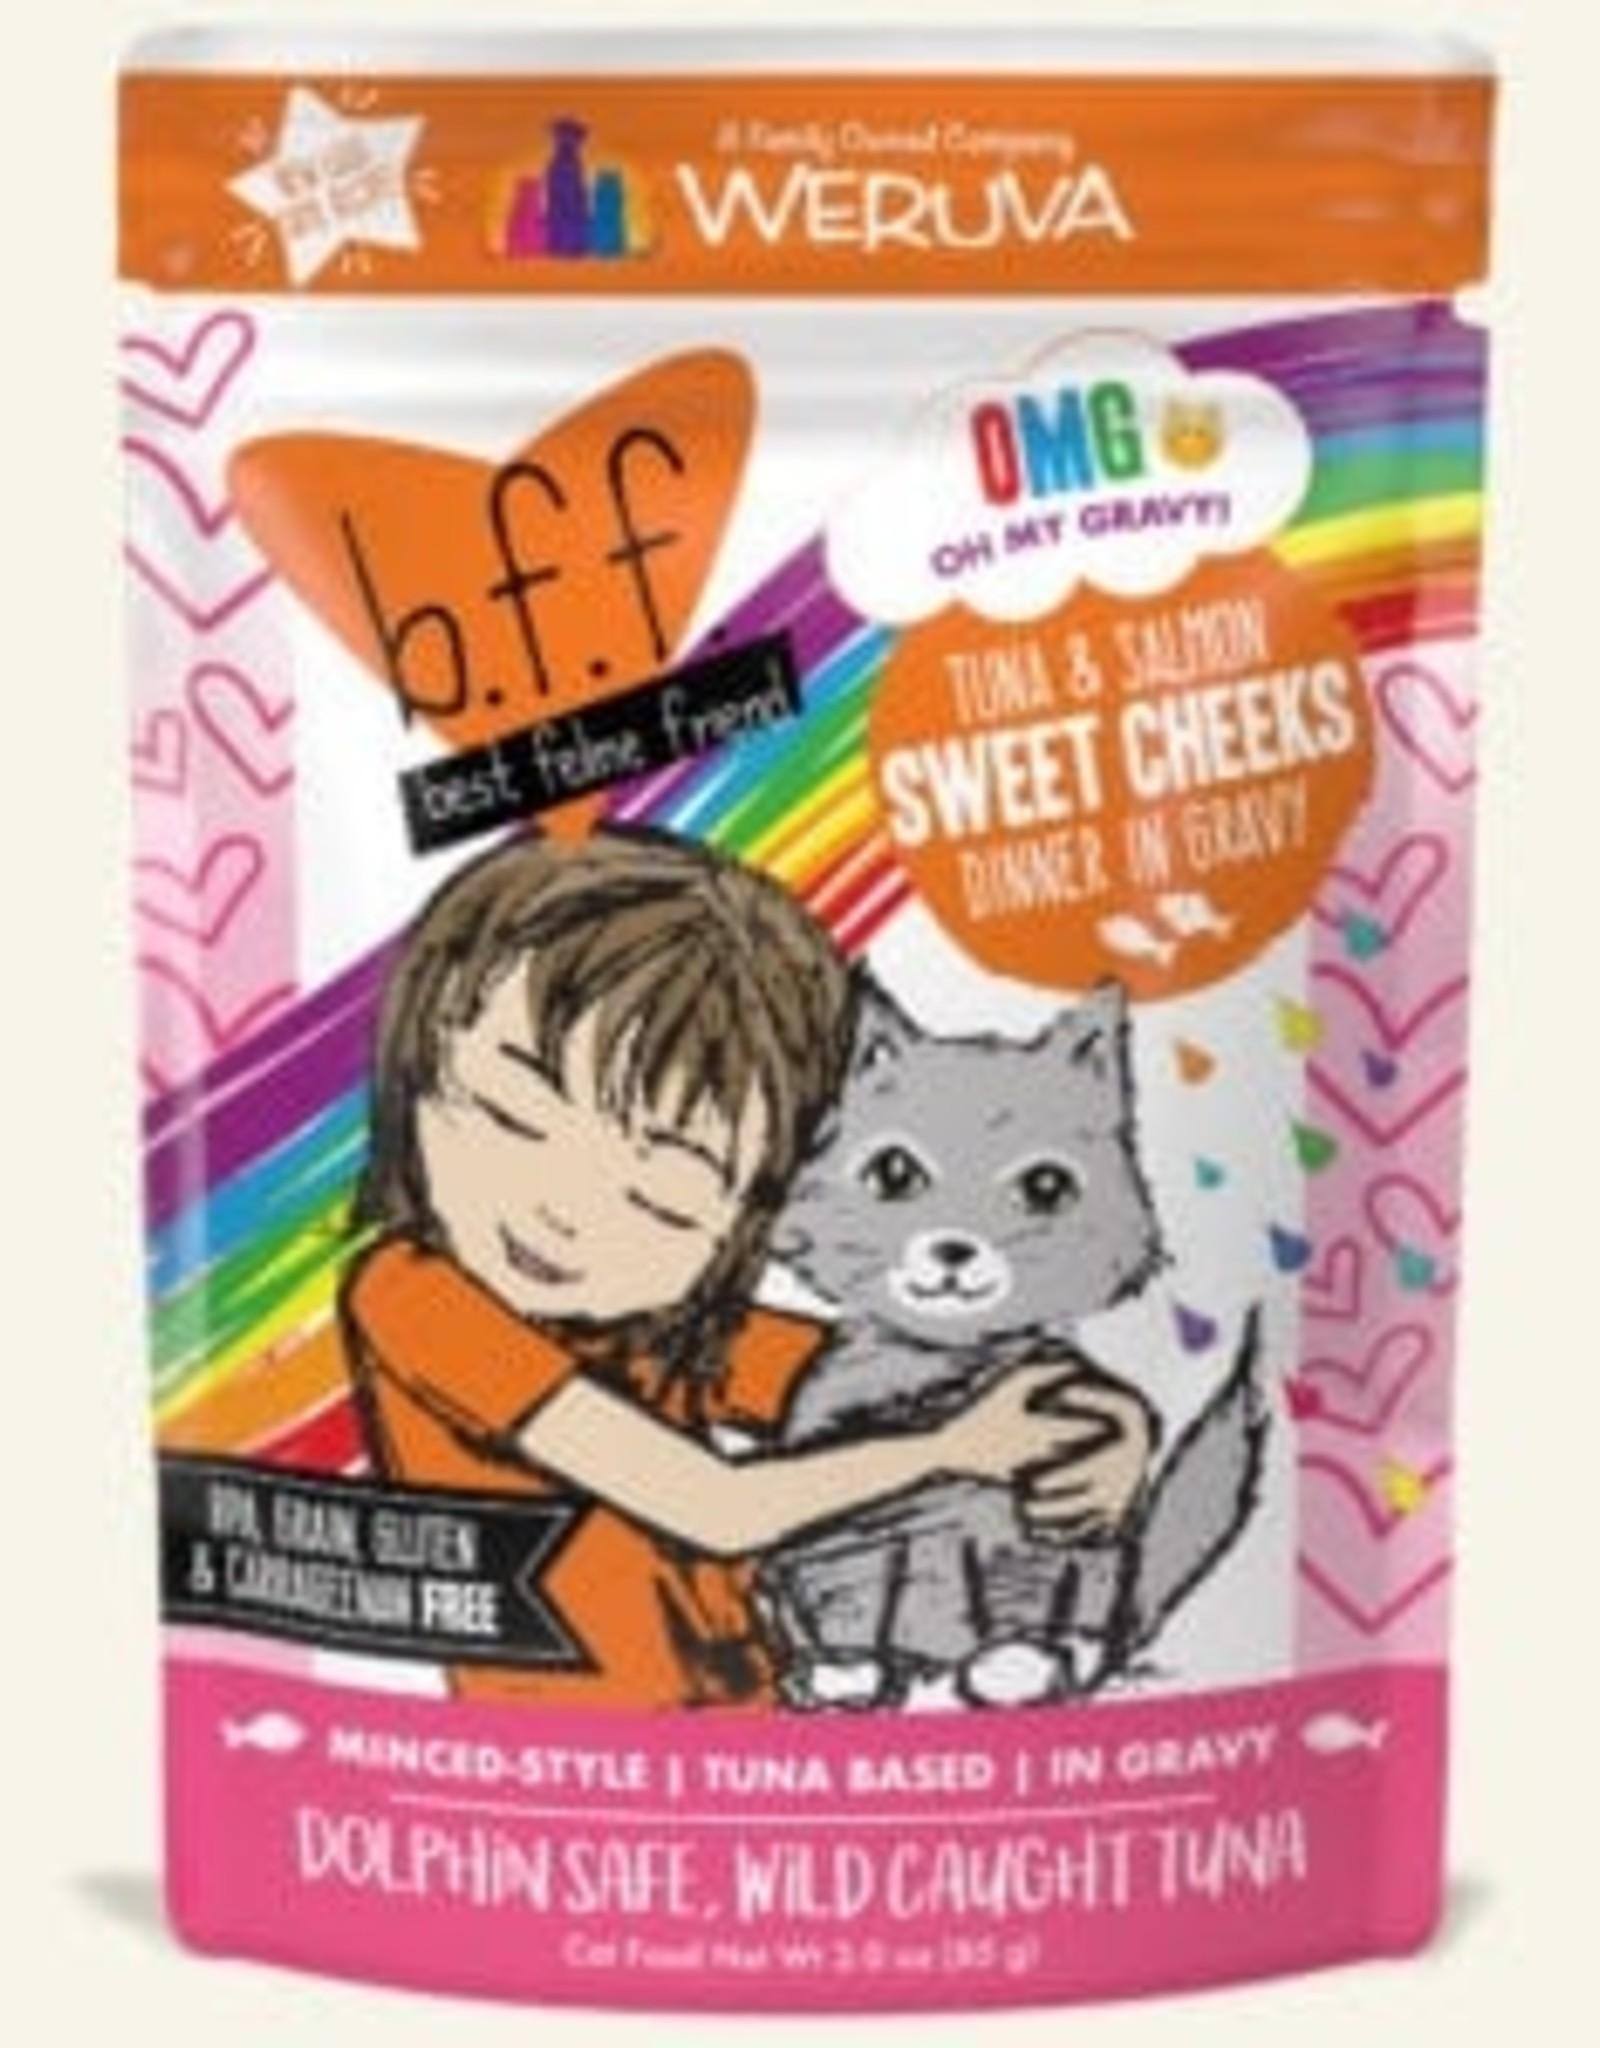 Weruva BFF - Tuna&Sam Sweet Cheek 3oz